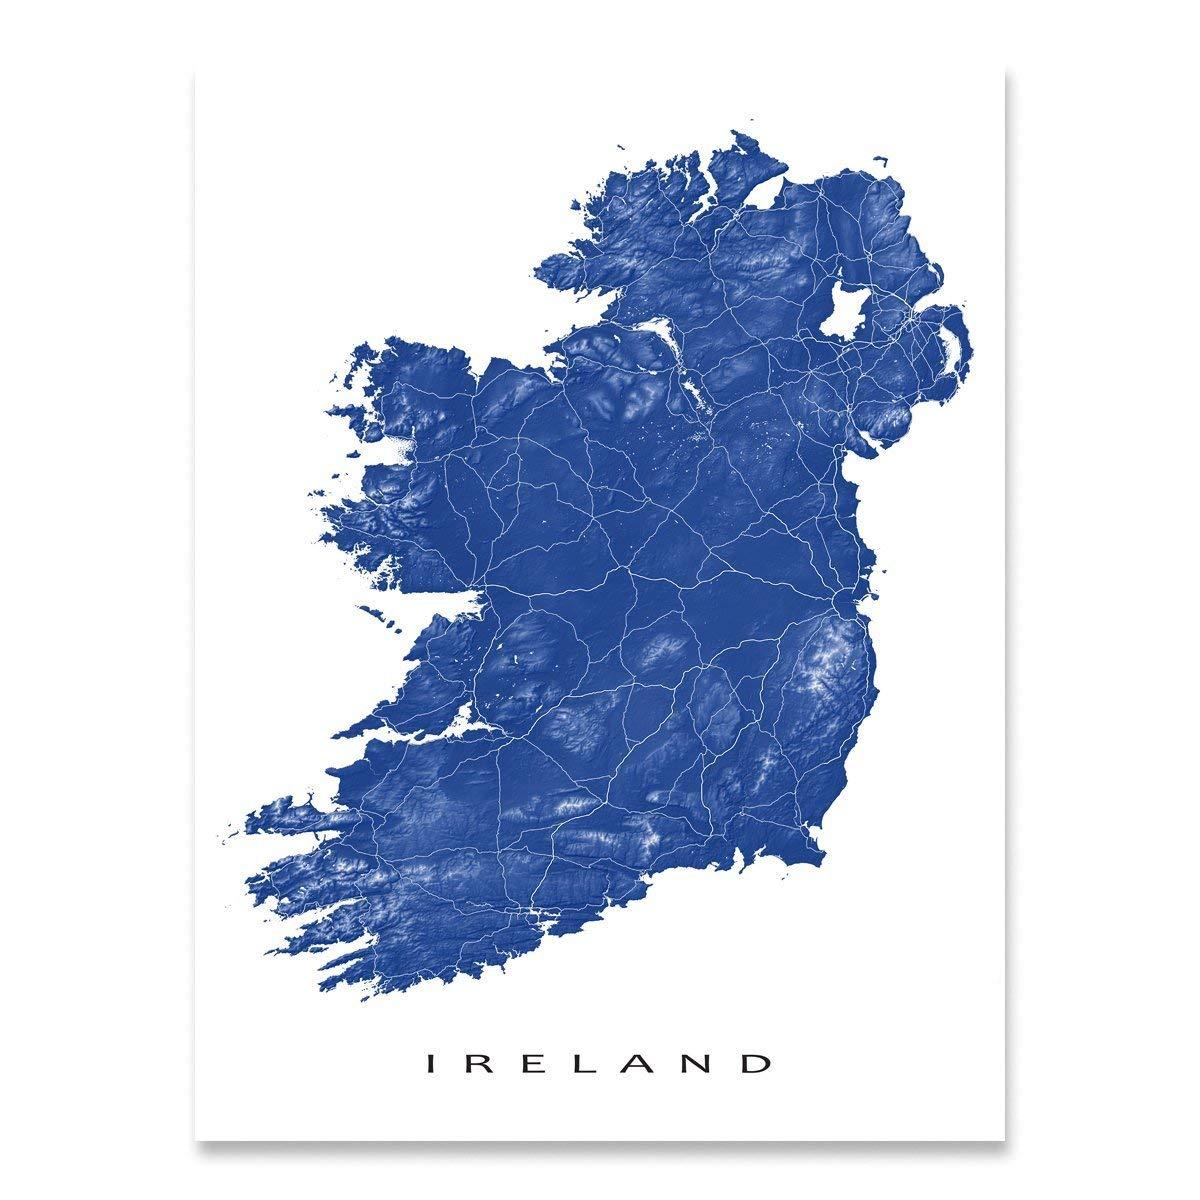 Republic Of Ireland And Northern Ireland Map.Amazon Com Ireland Map Print Landscape Art Northern Ireland